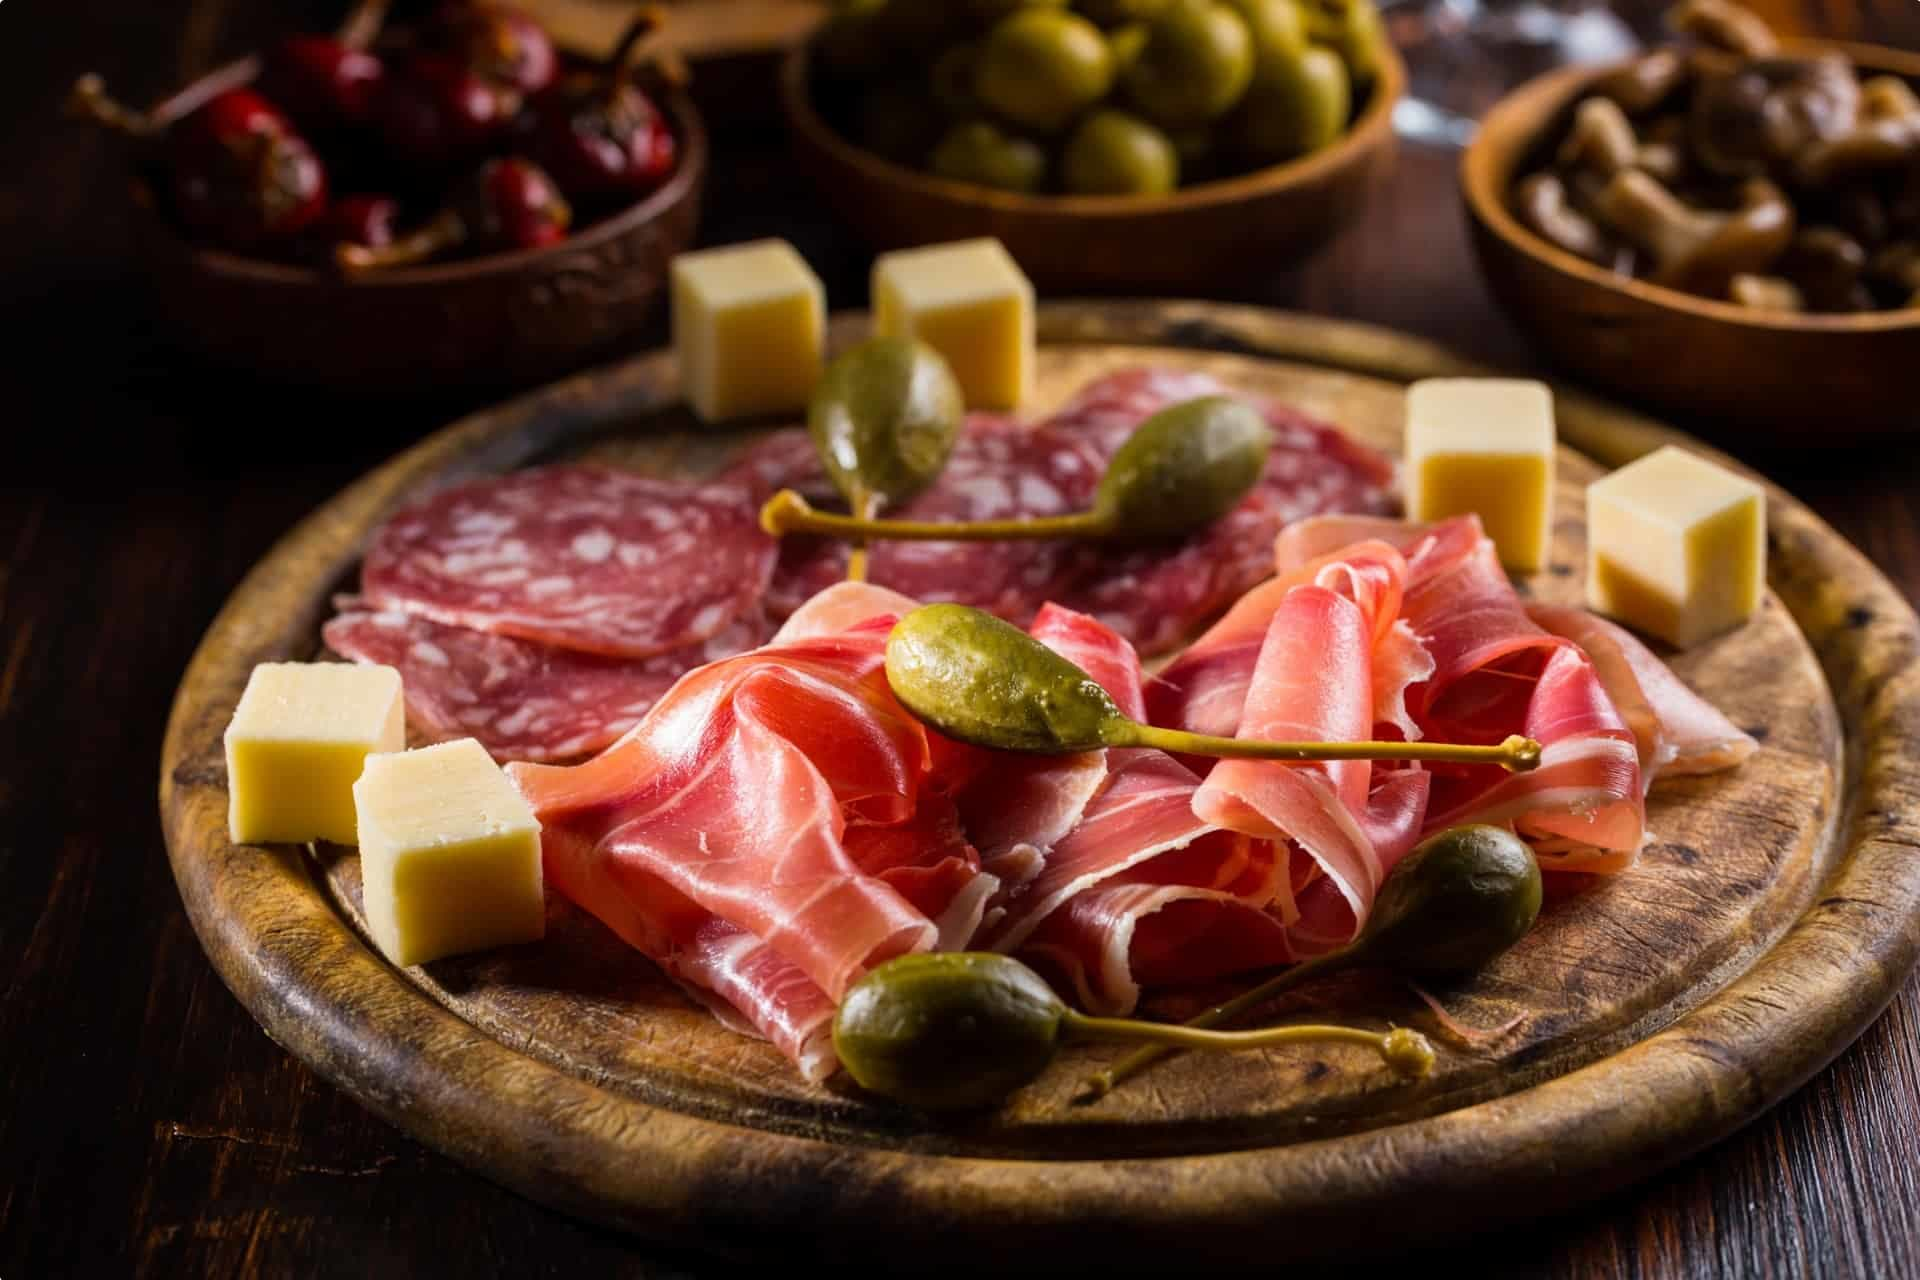 Jamon or cured ham